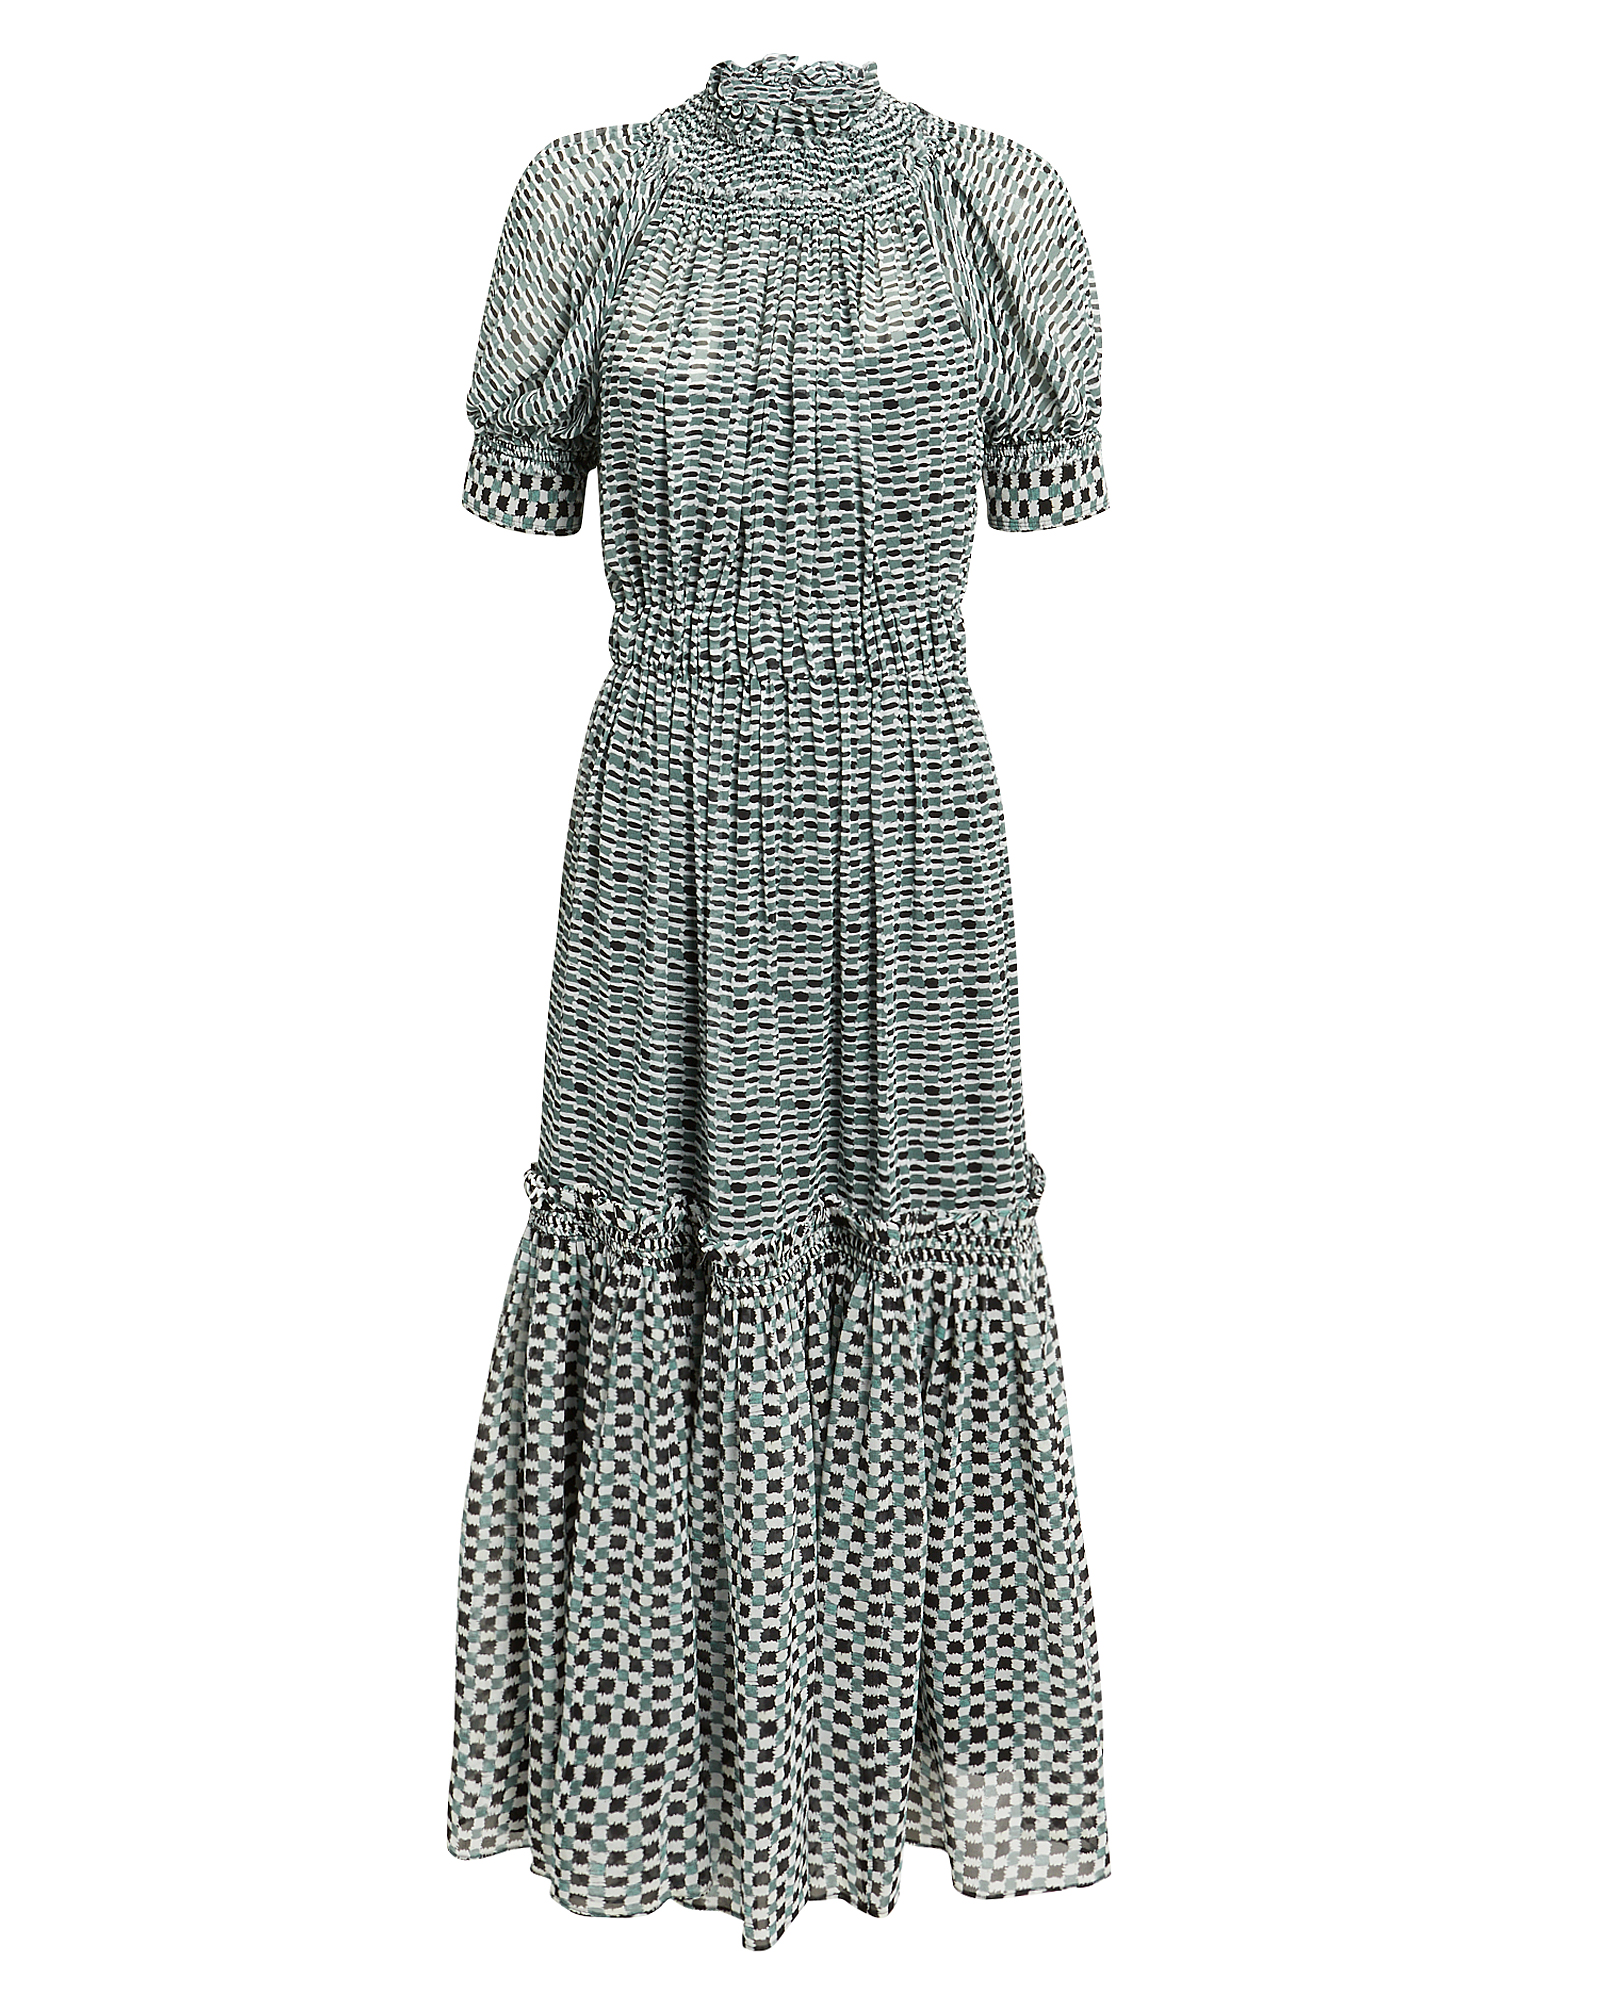 Proenza Schouler Printed Midi Dress